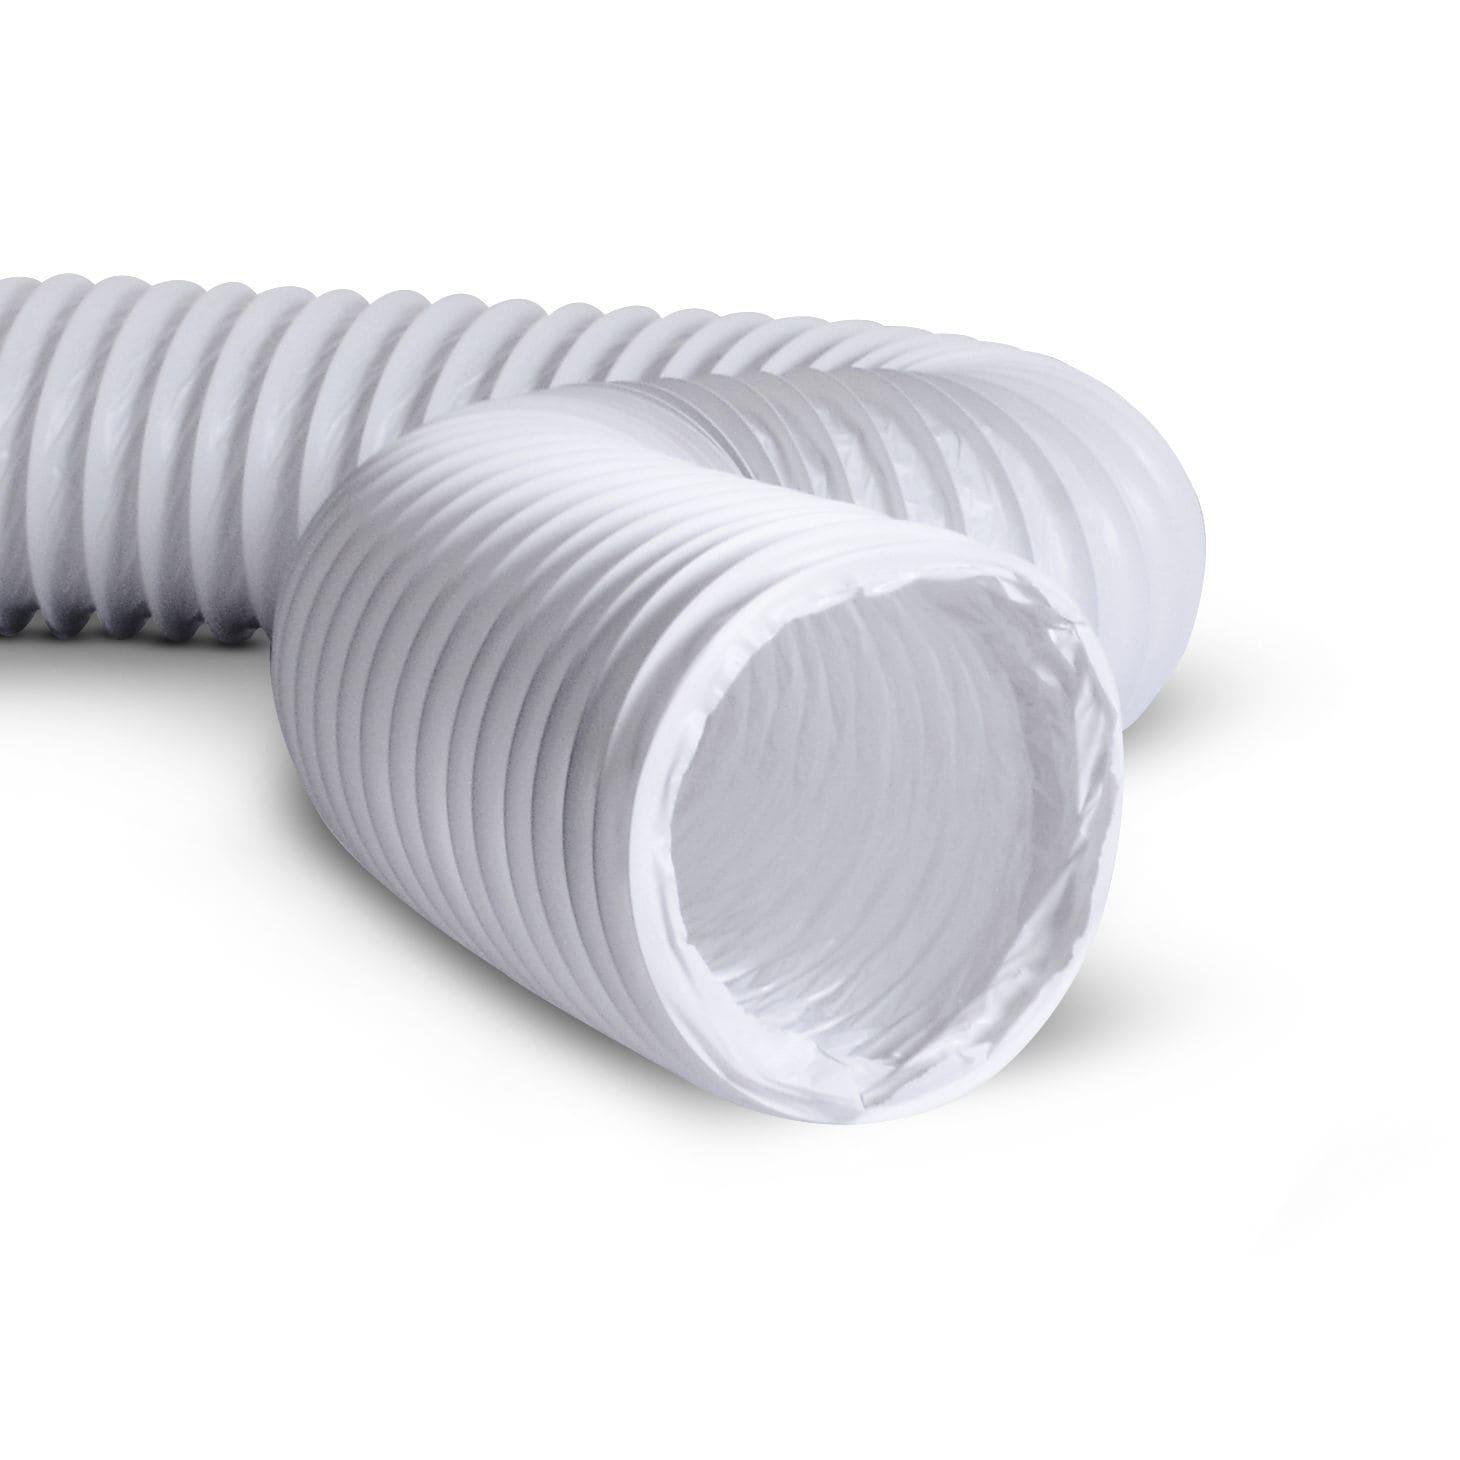 PVC Flexible Air Ducts Supplier Oman